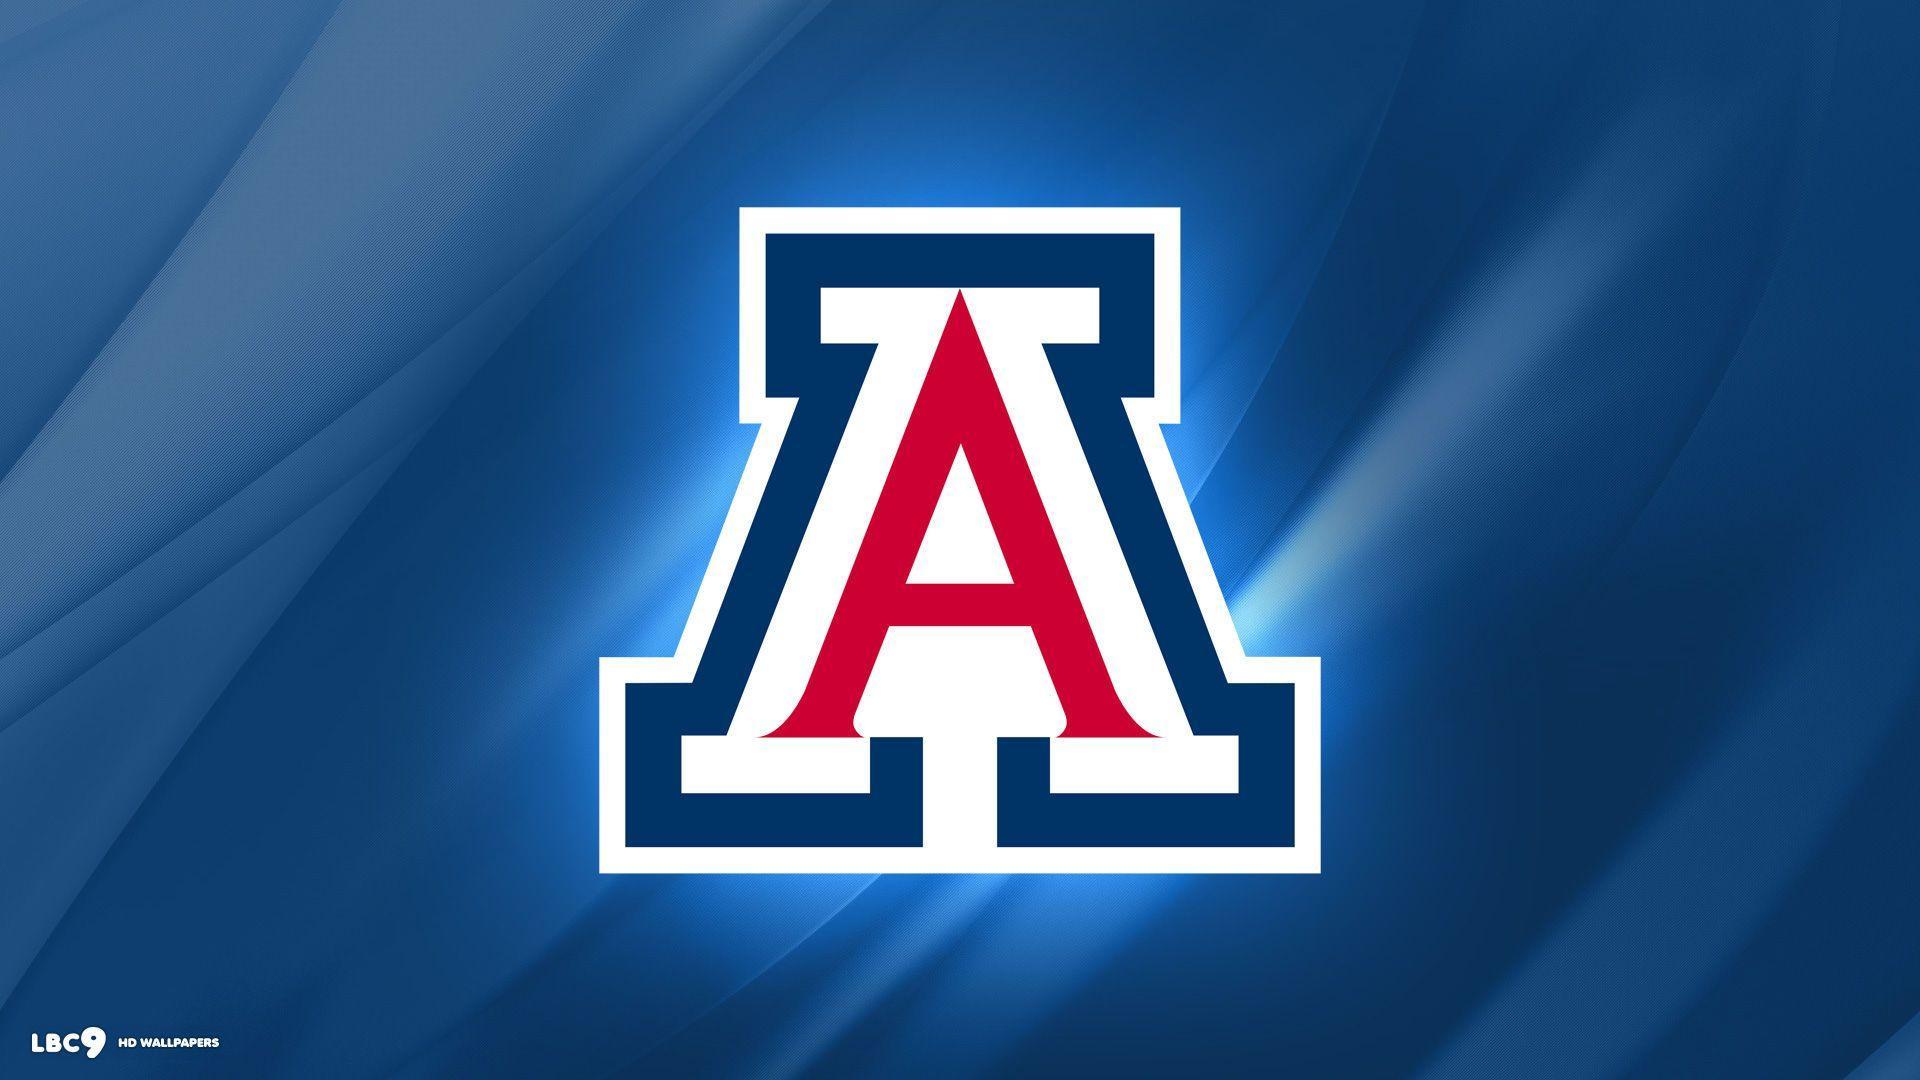 University Of Arizona Wallpapers Top Free University Of Arizona Backgrounds Wallpaperaccess